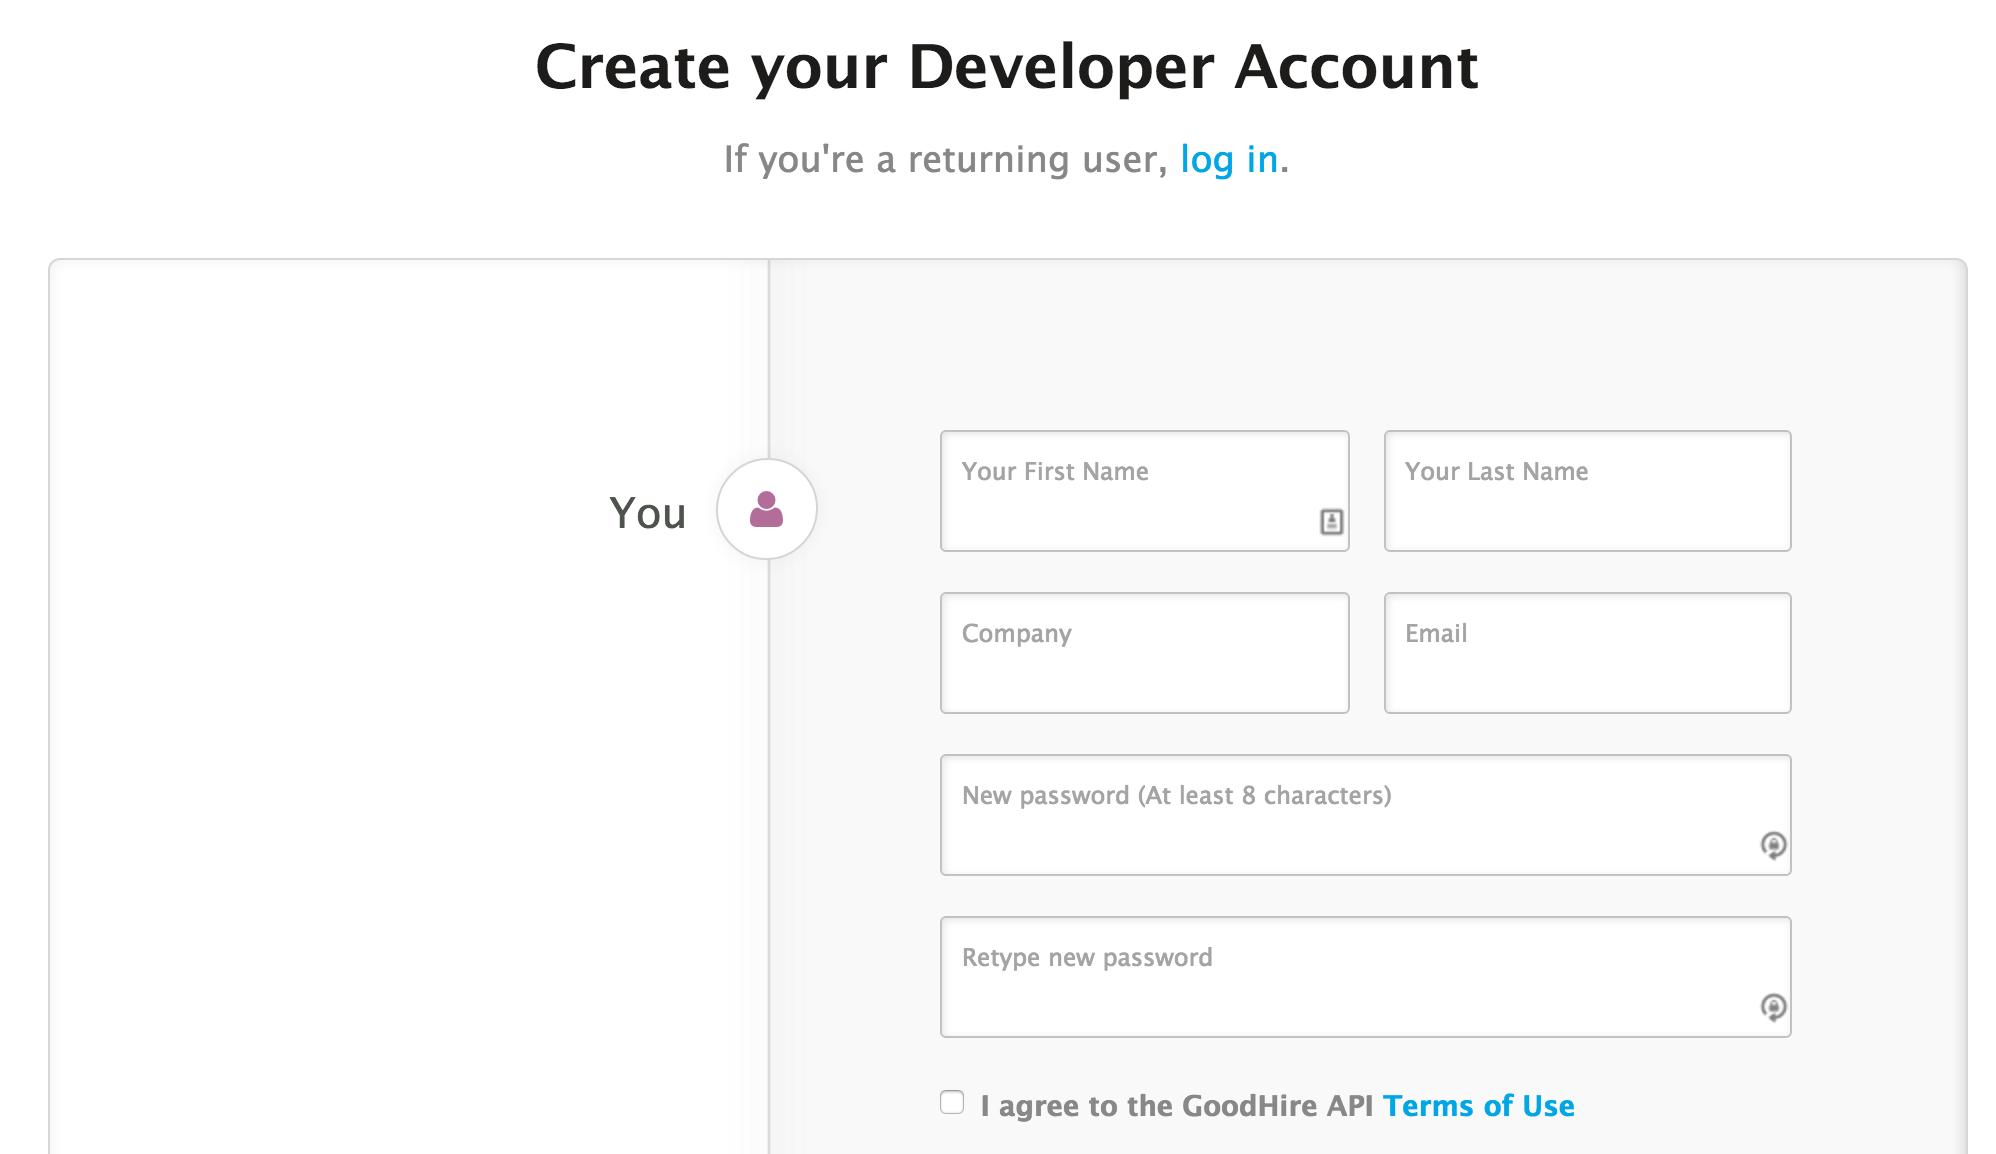 Creating a GoodHire Developer Account